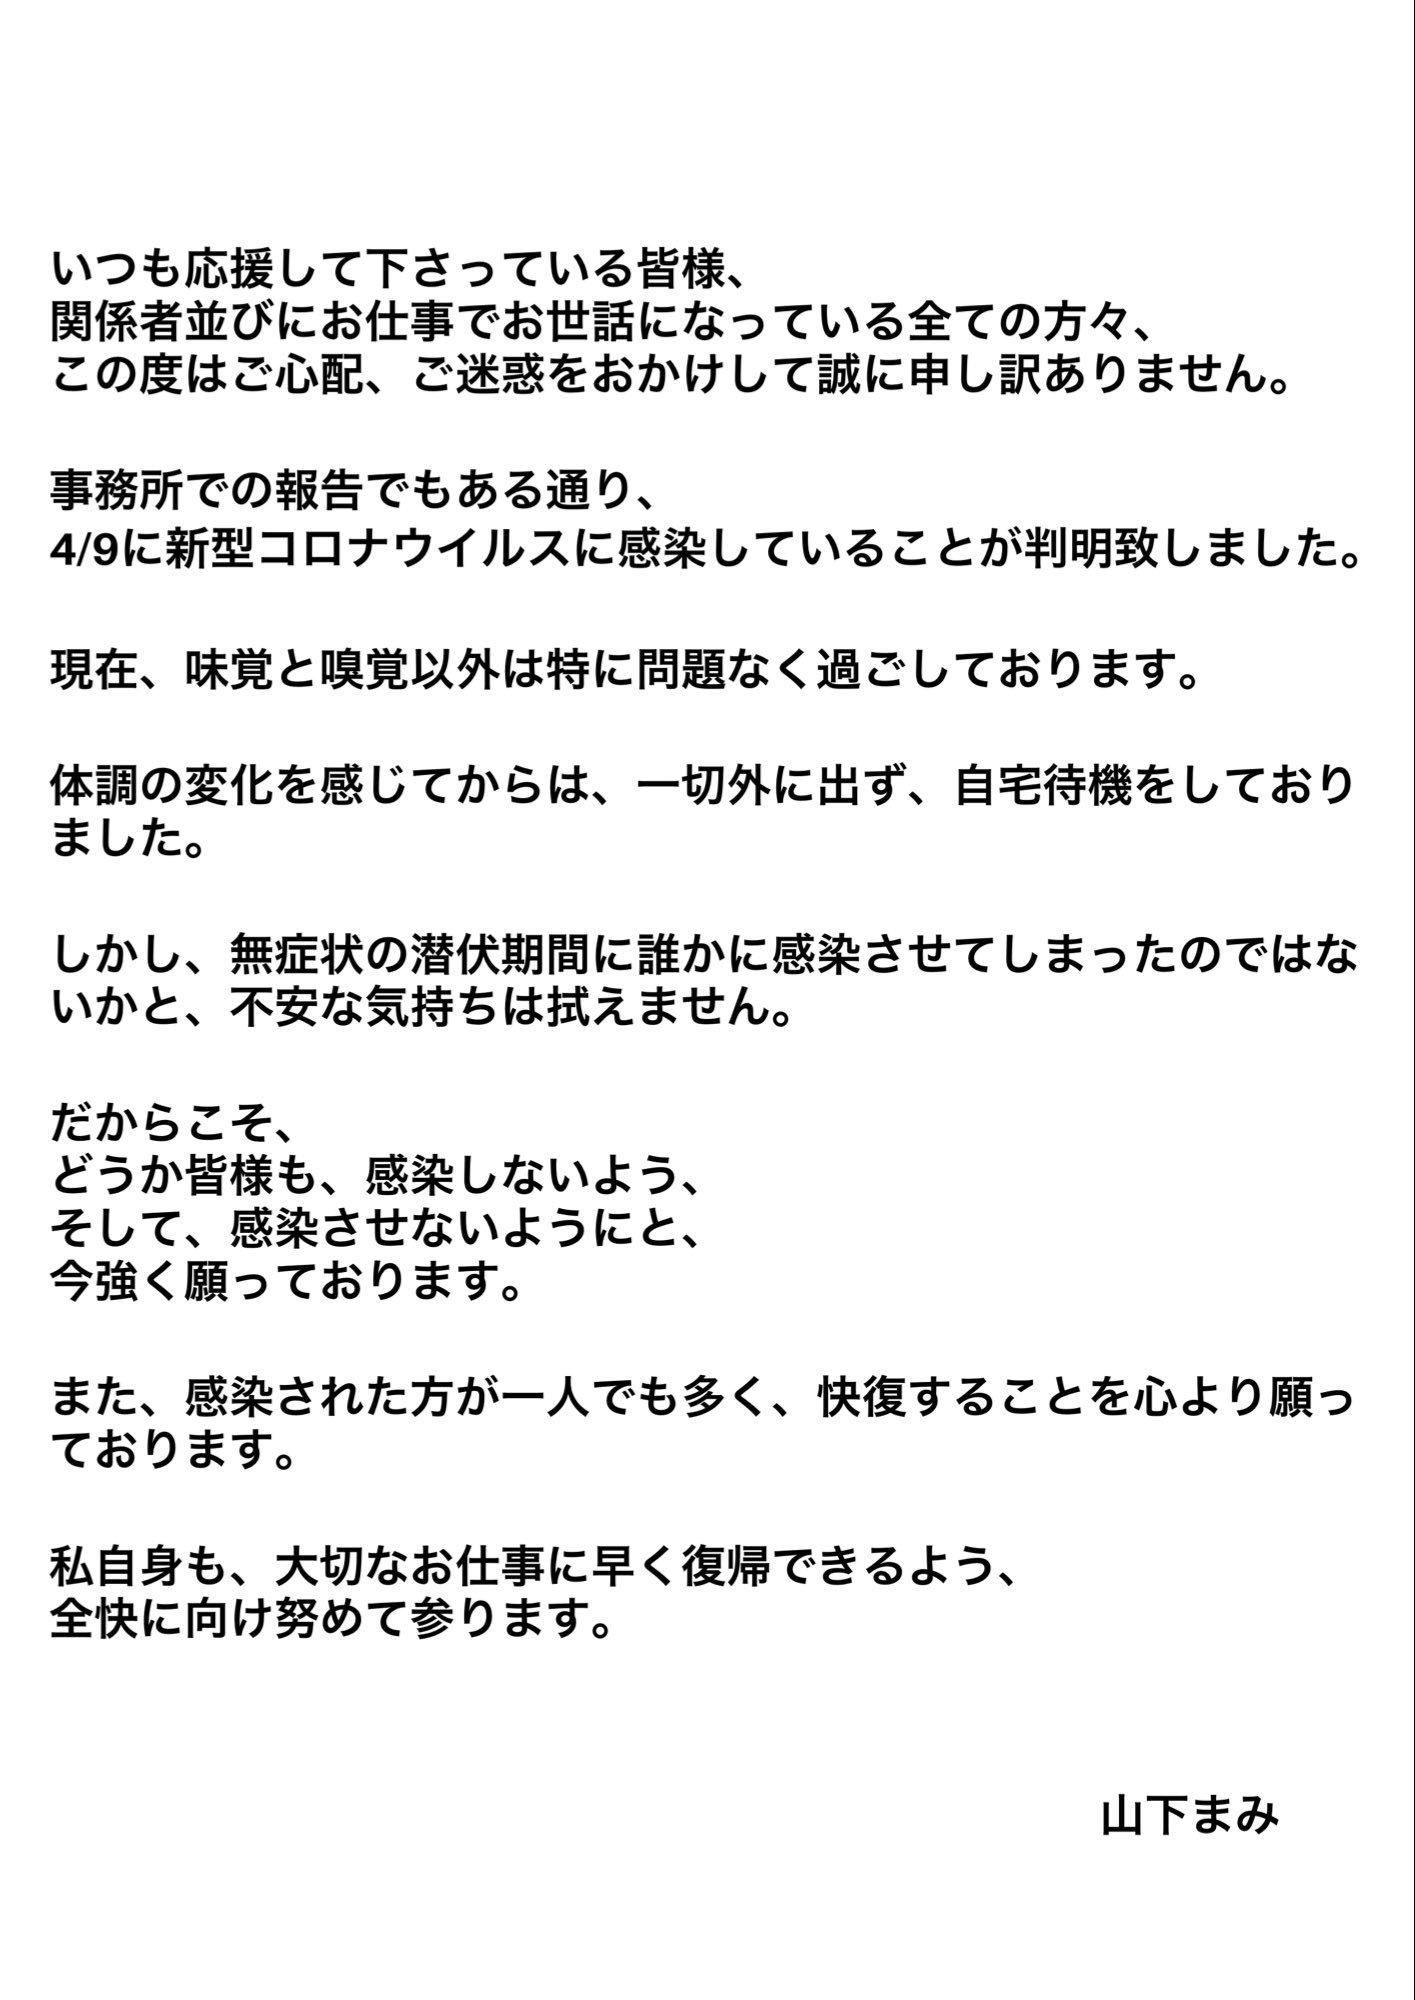 yamashita_mami 1248452934297243652_p0